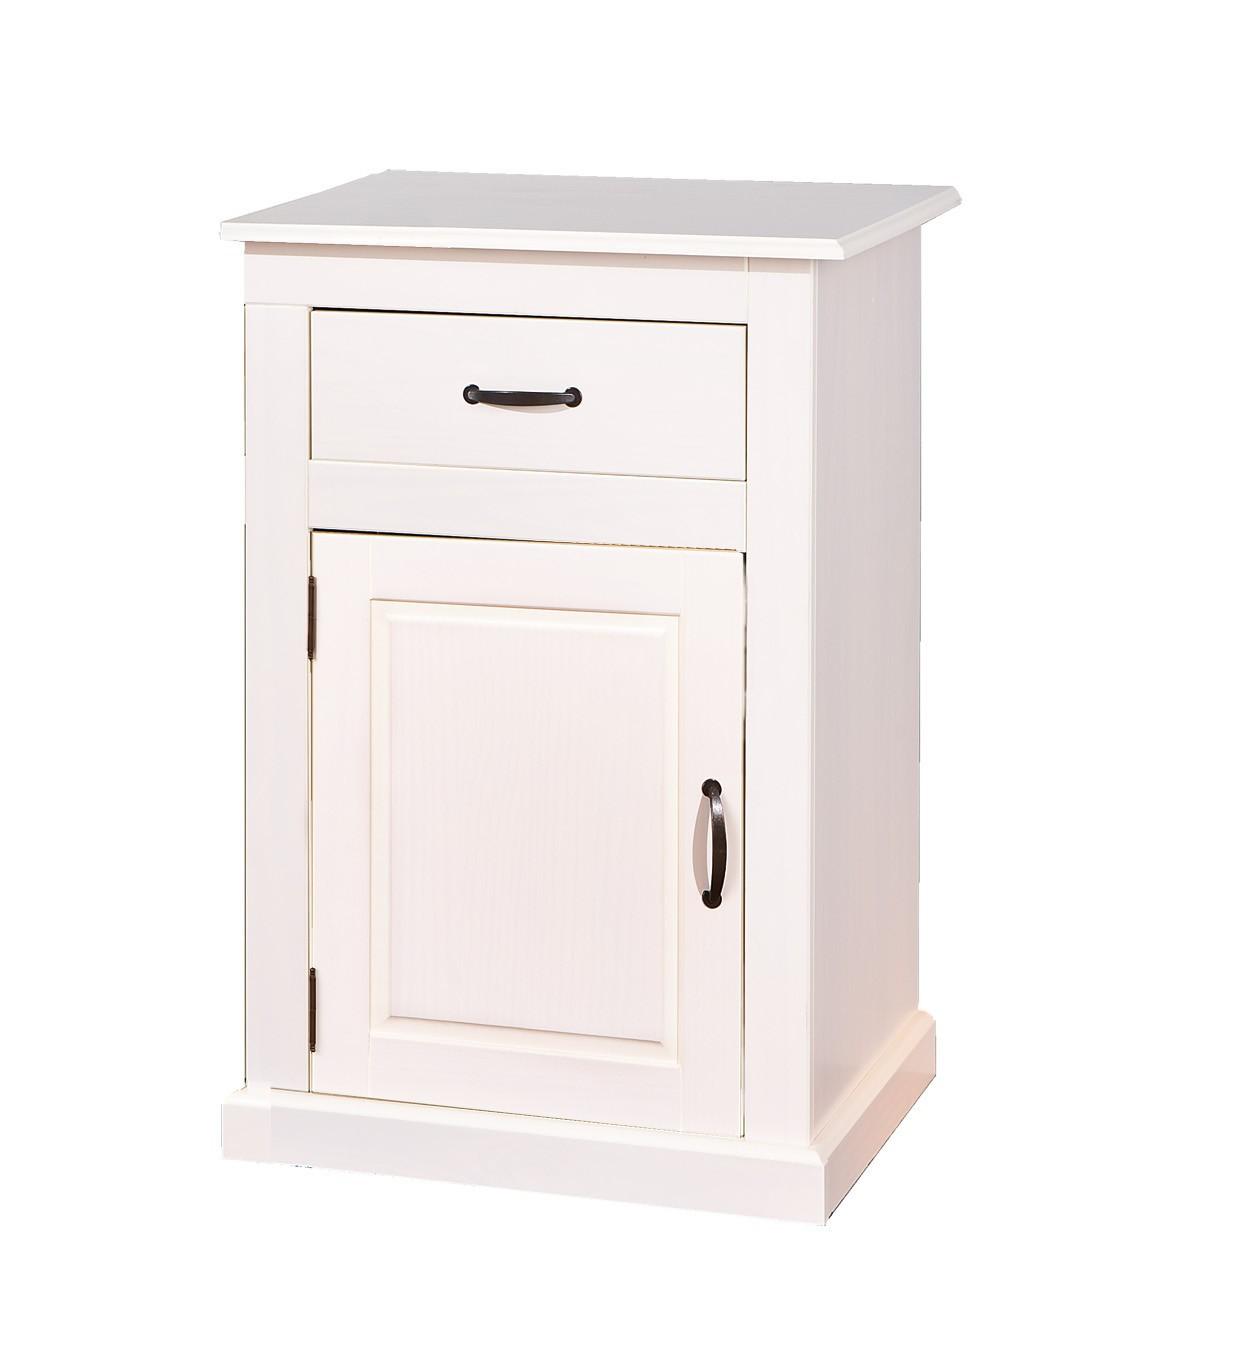 bahut bas cassala 1 porte 1 tiroir blanc. Black Bedroom Furniture Sets. Home Design Ideas